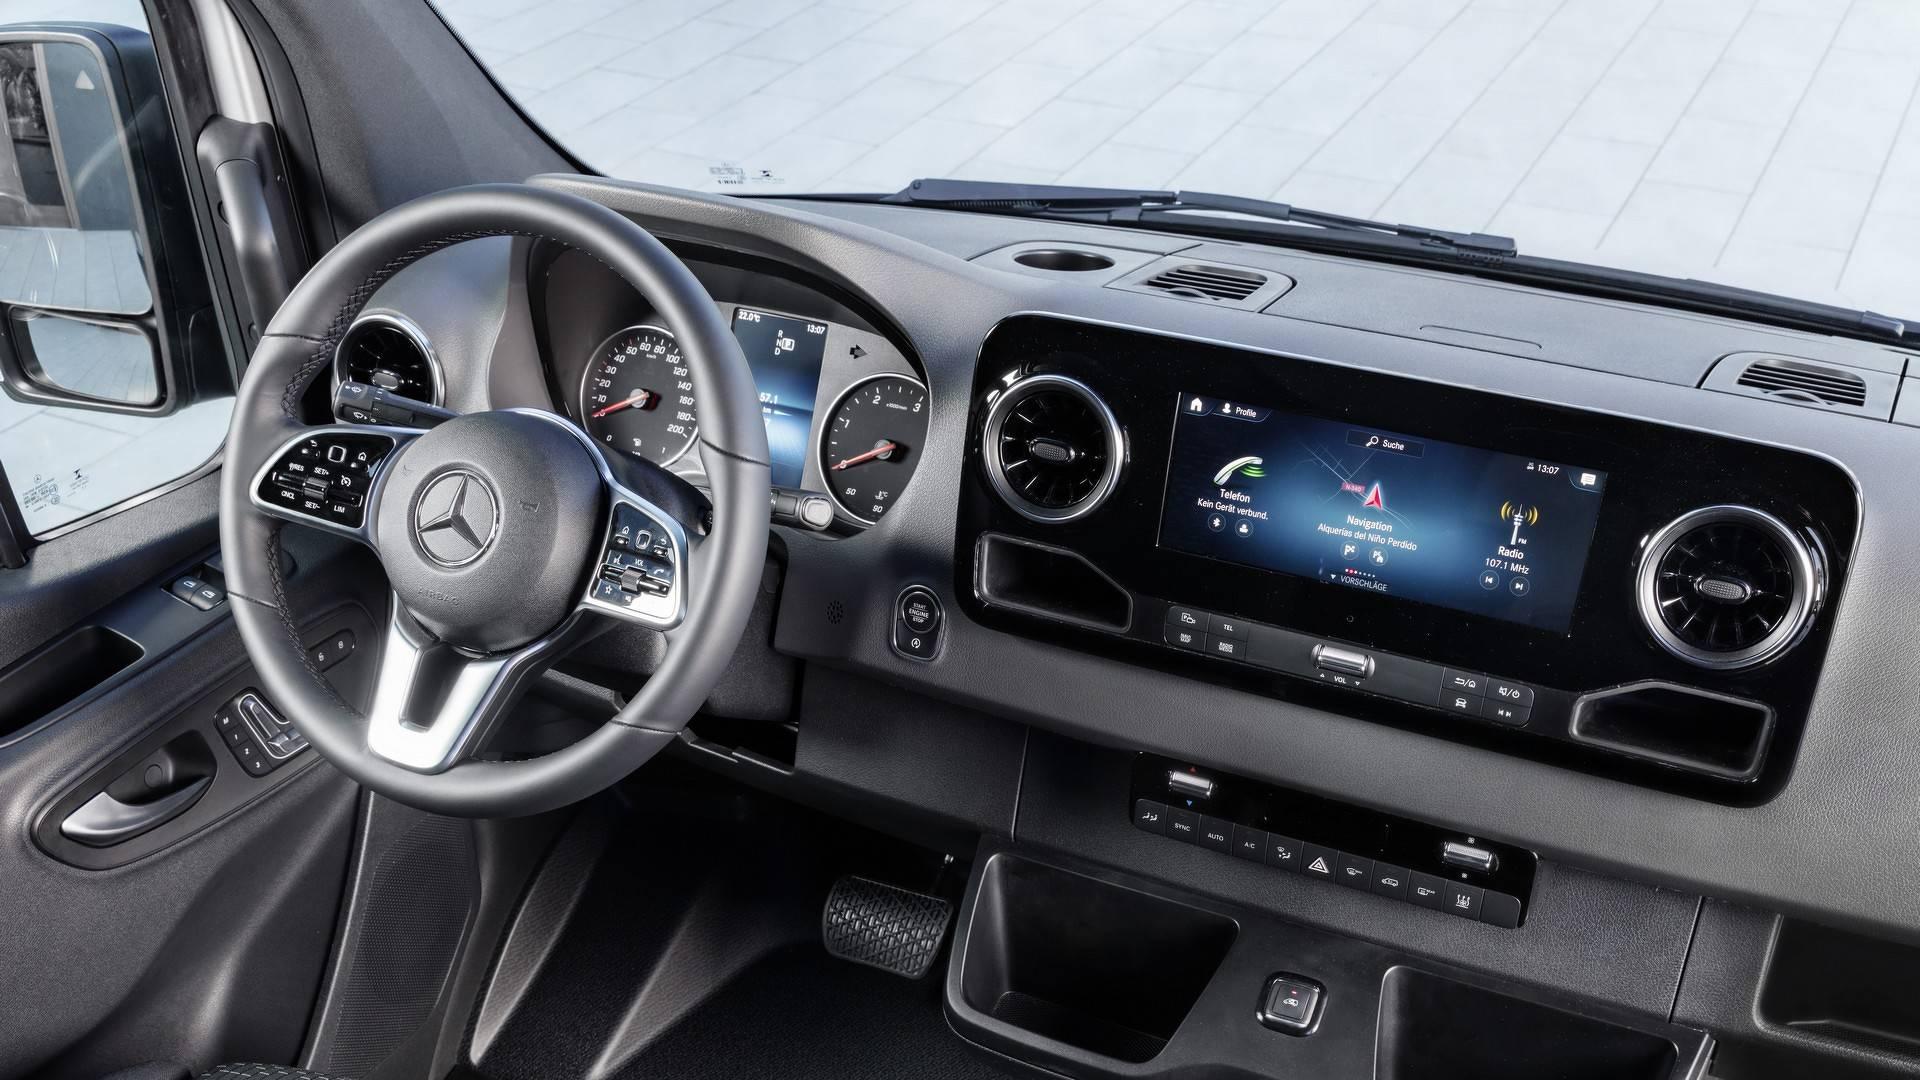 Mercedes Sprinter 2018 Yeni Kasa >> 2018 Mercedes Sprinter Cok Yonlu Yapisiyla Tanitildi